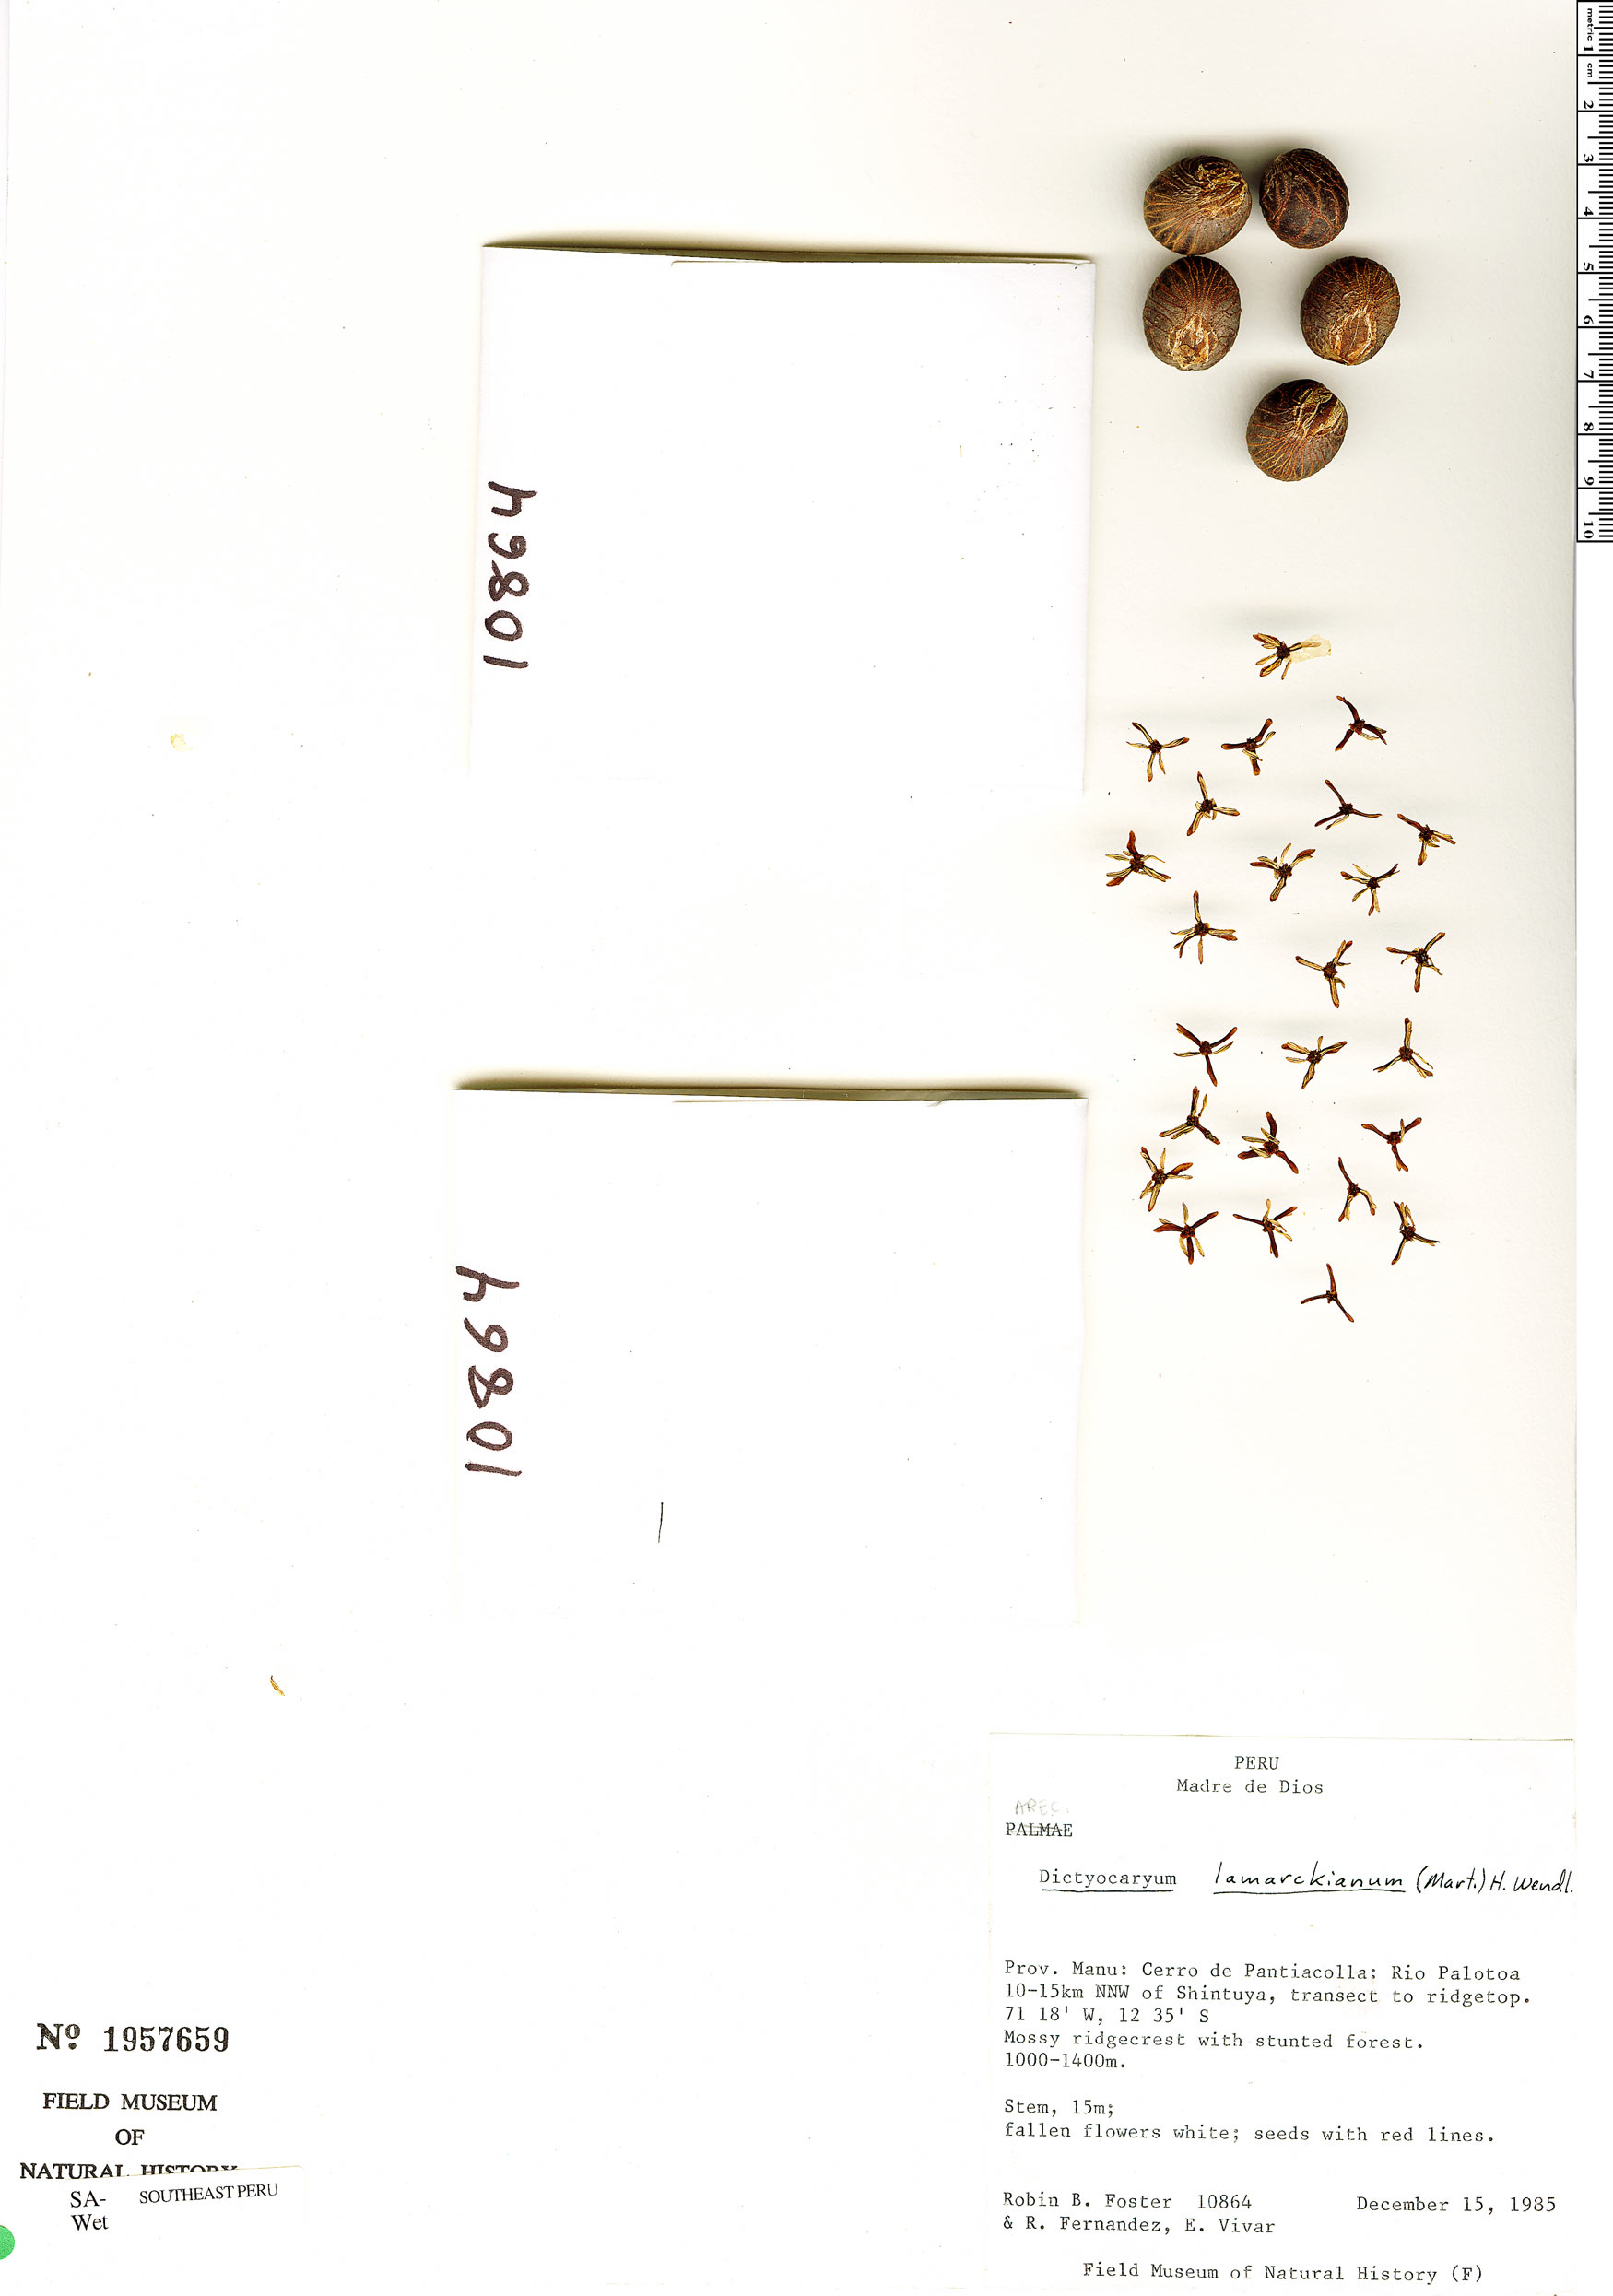 Specimen: Dictyocaryum lamarckianum